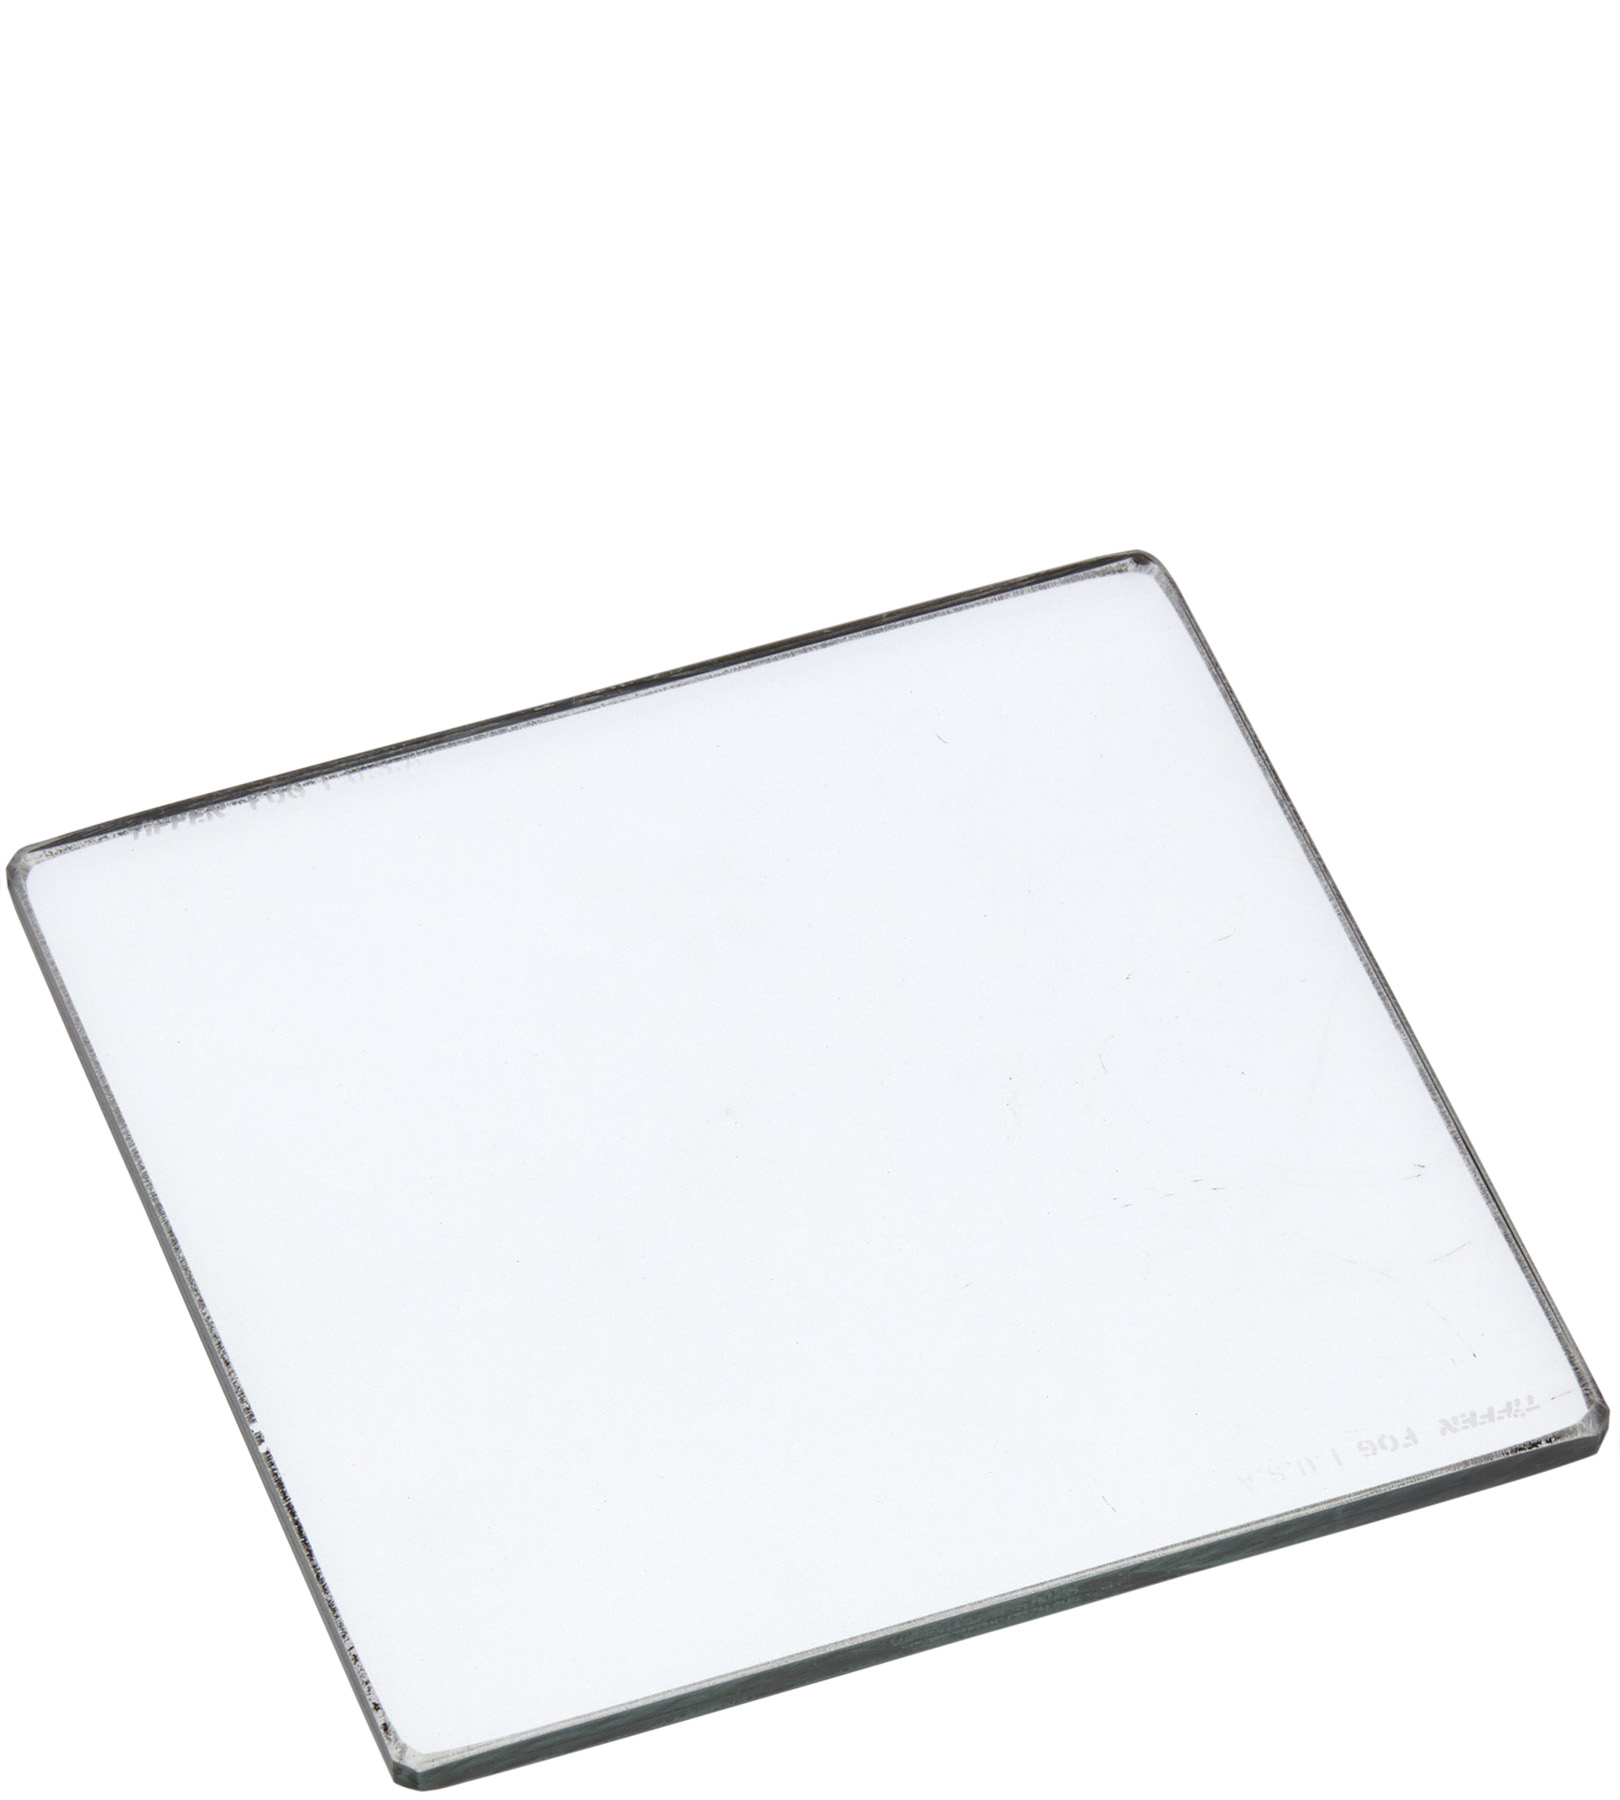 Filtro de lente 4x4 Tiffen Fog 1